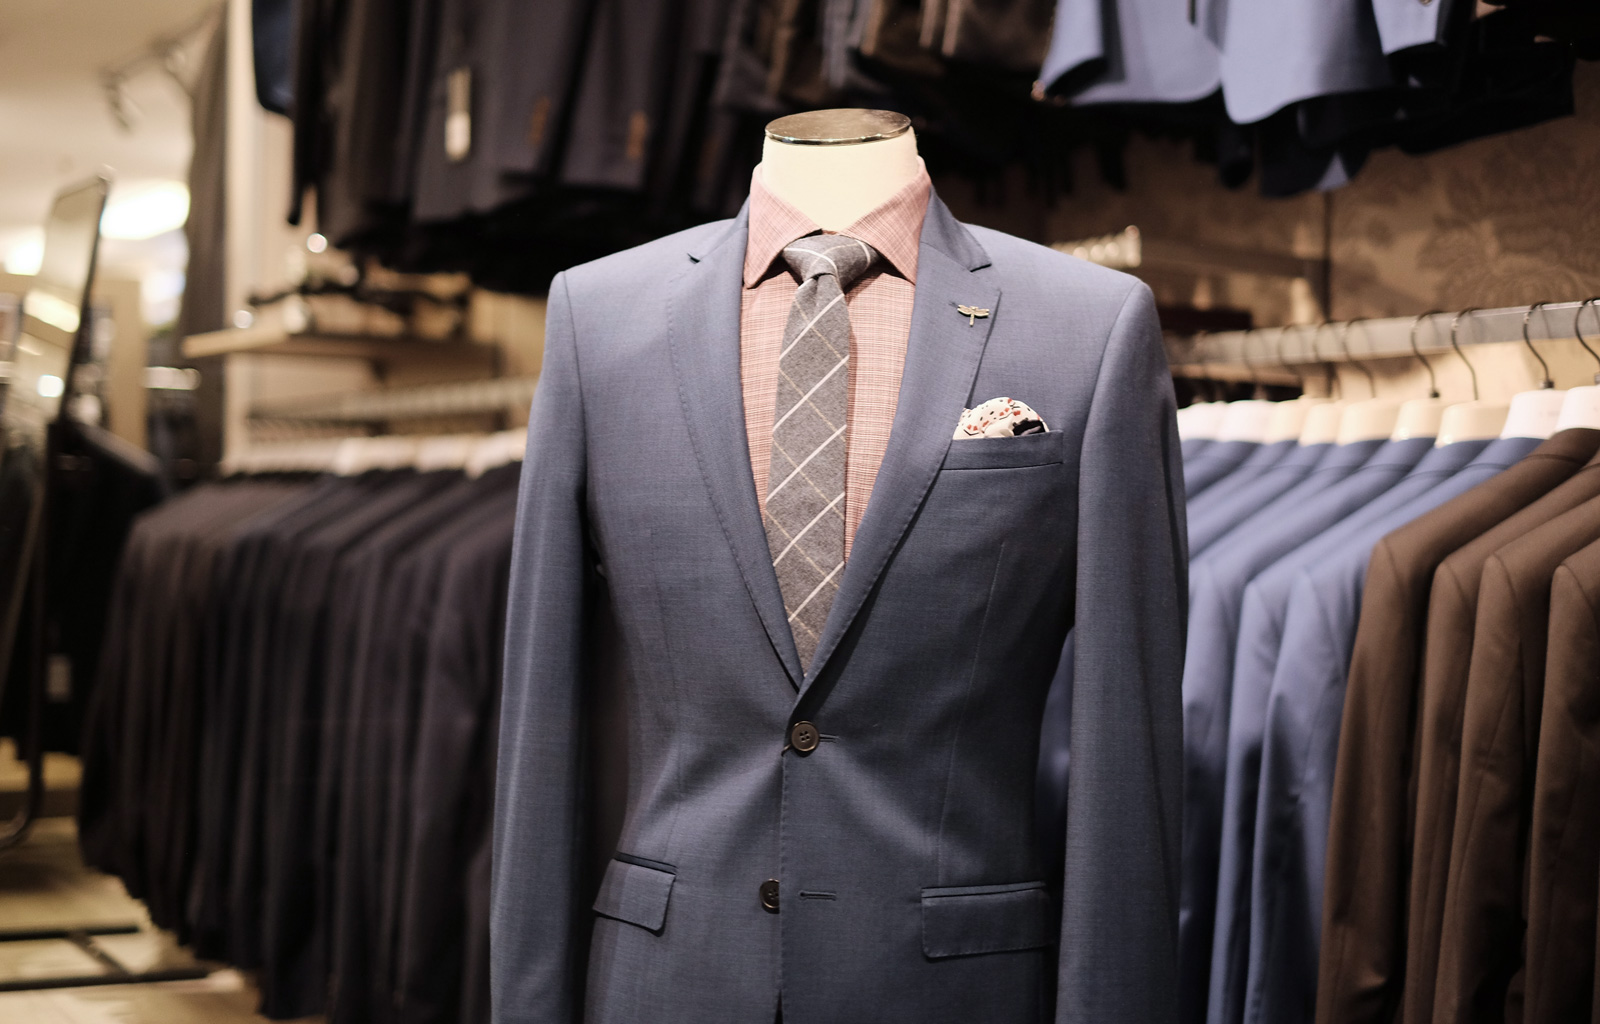 da1bbc03804a19 Peter Shearer Menswear – Regent Arcade